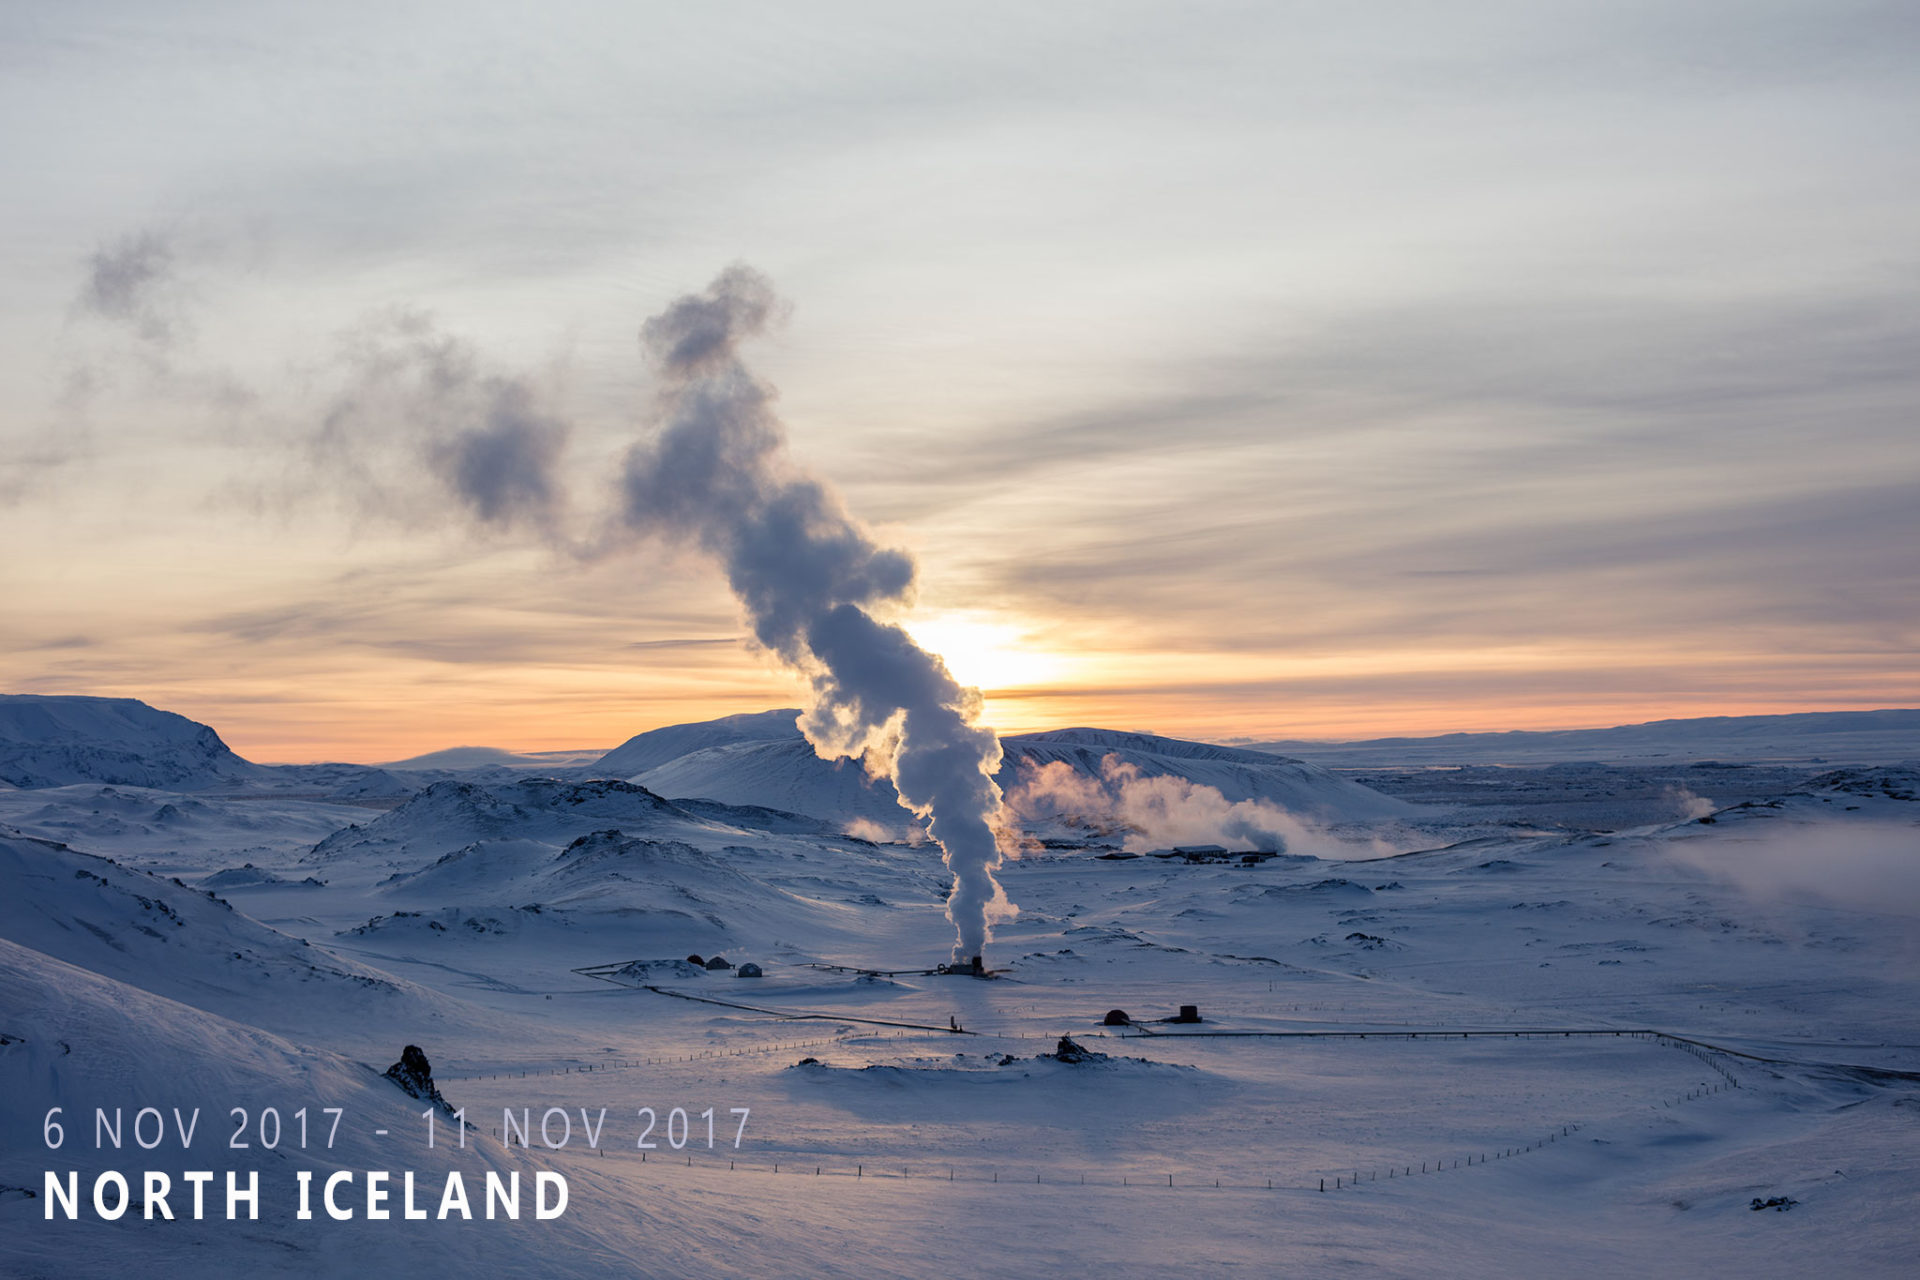 Iceland, November 2017 // Islande, Novembre 2017